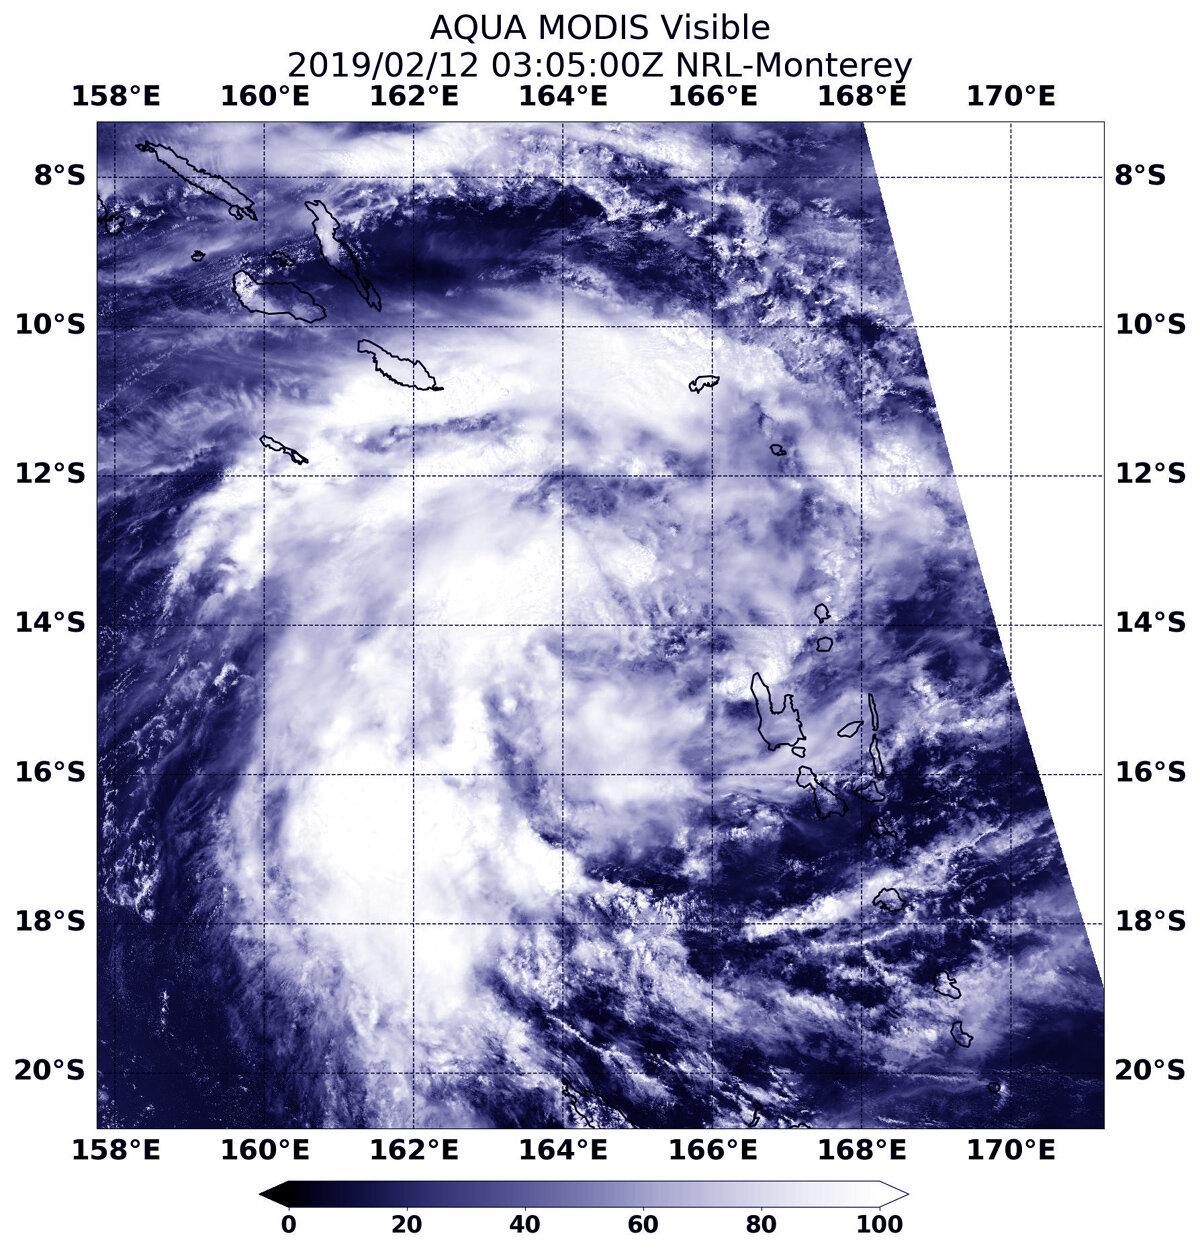 Aqua satellite catches development of Tropical Cyclone Oma